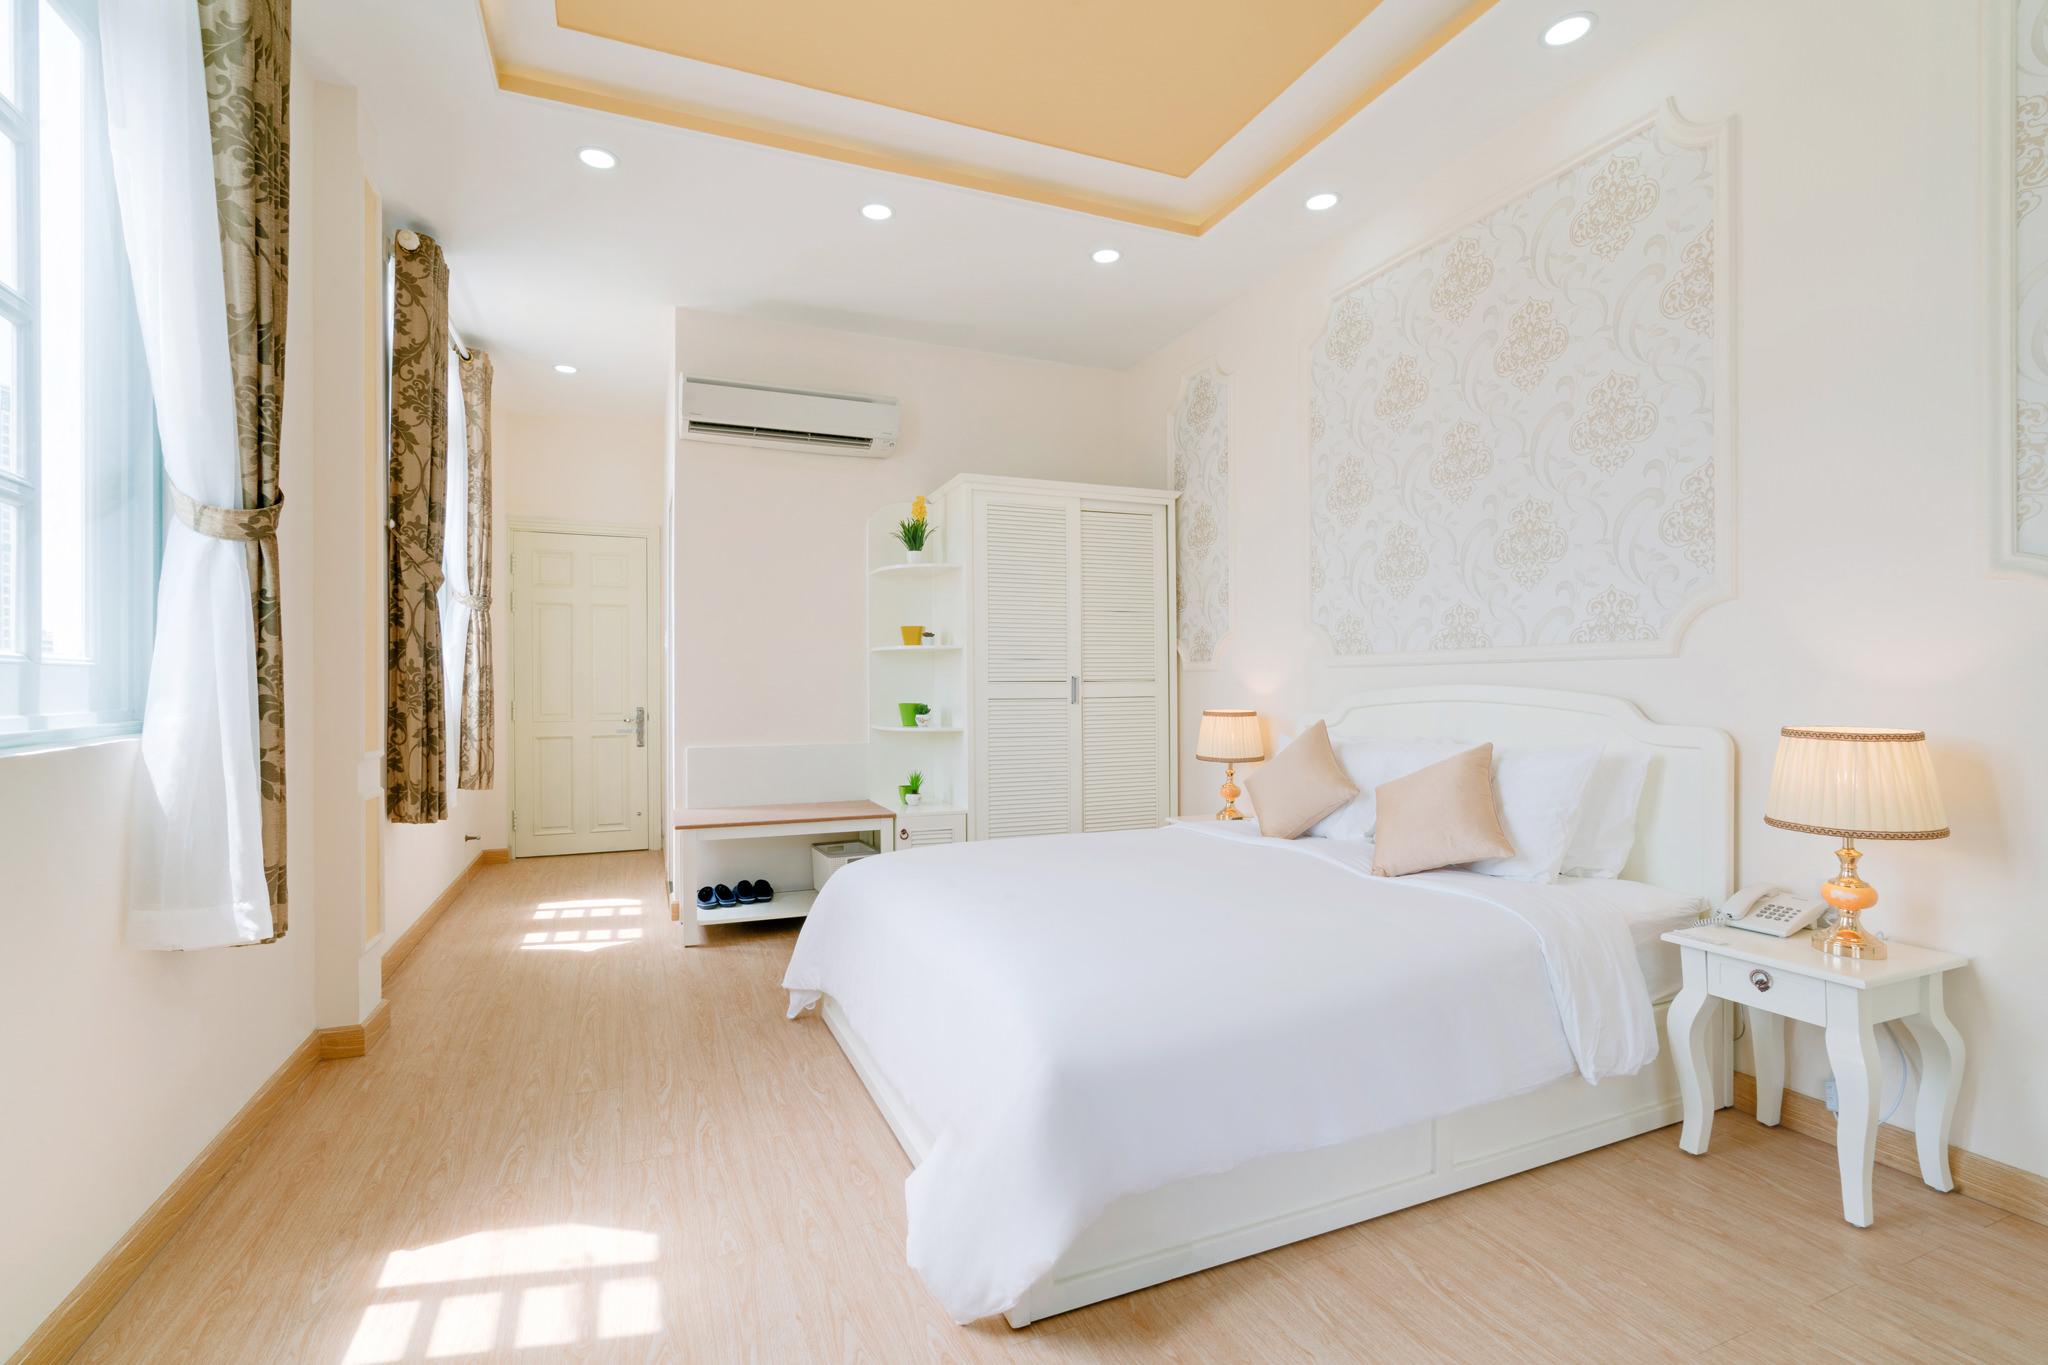 20180529 - Chez Mimosa - Interior - Hotel - 025.jpg